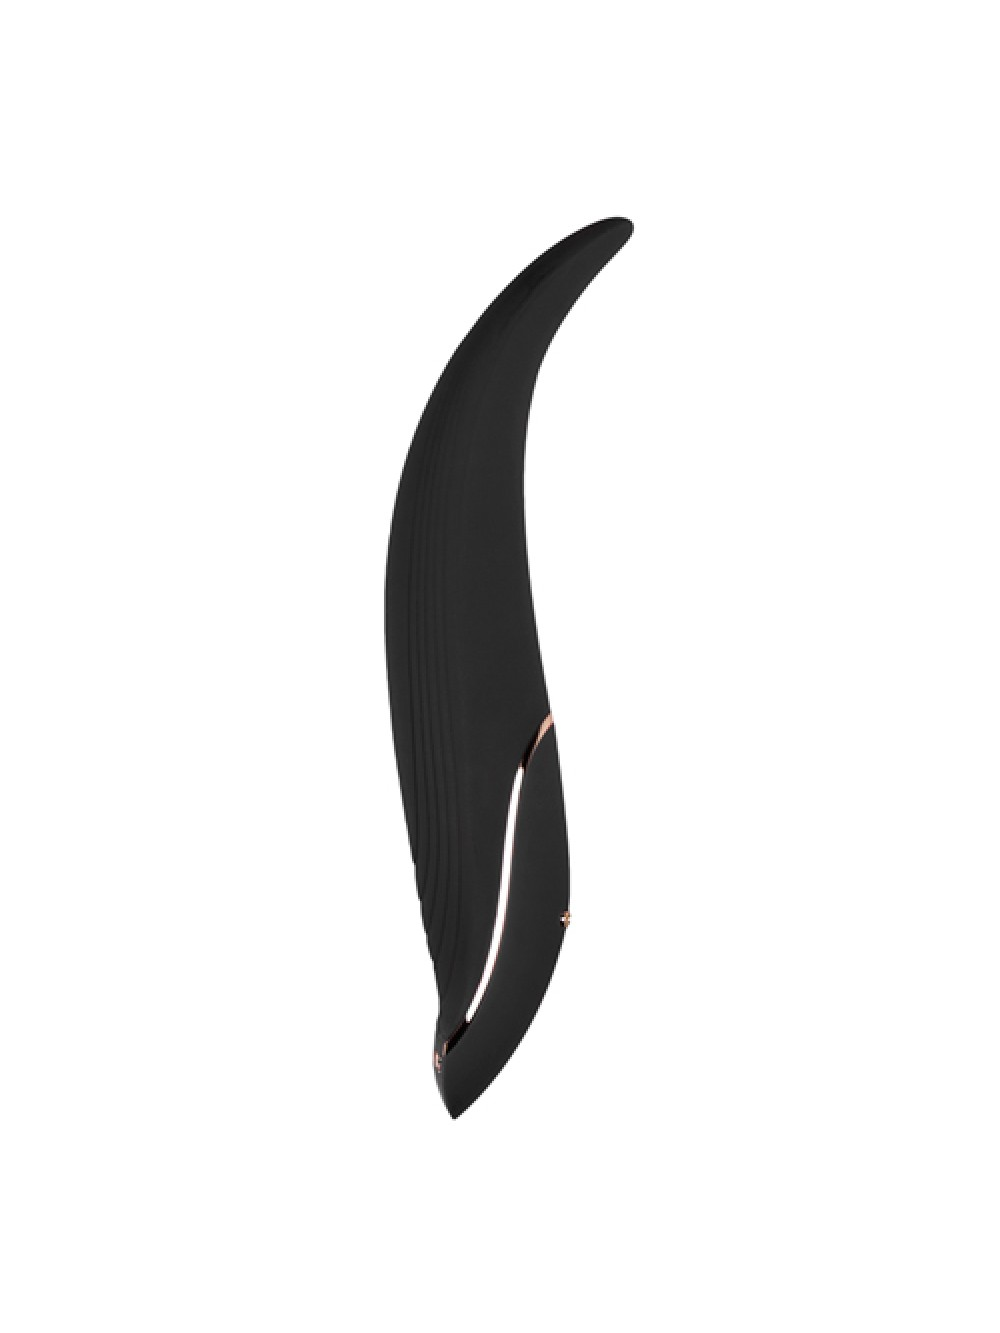 Aviva vibrator - Black 8714273606907